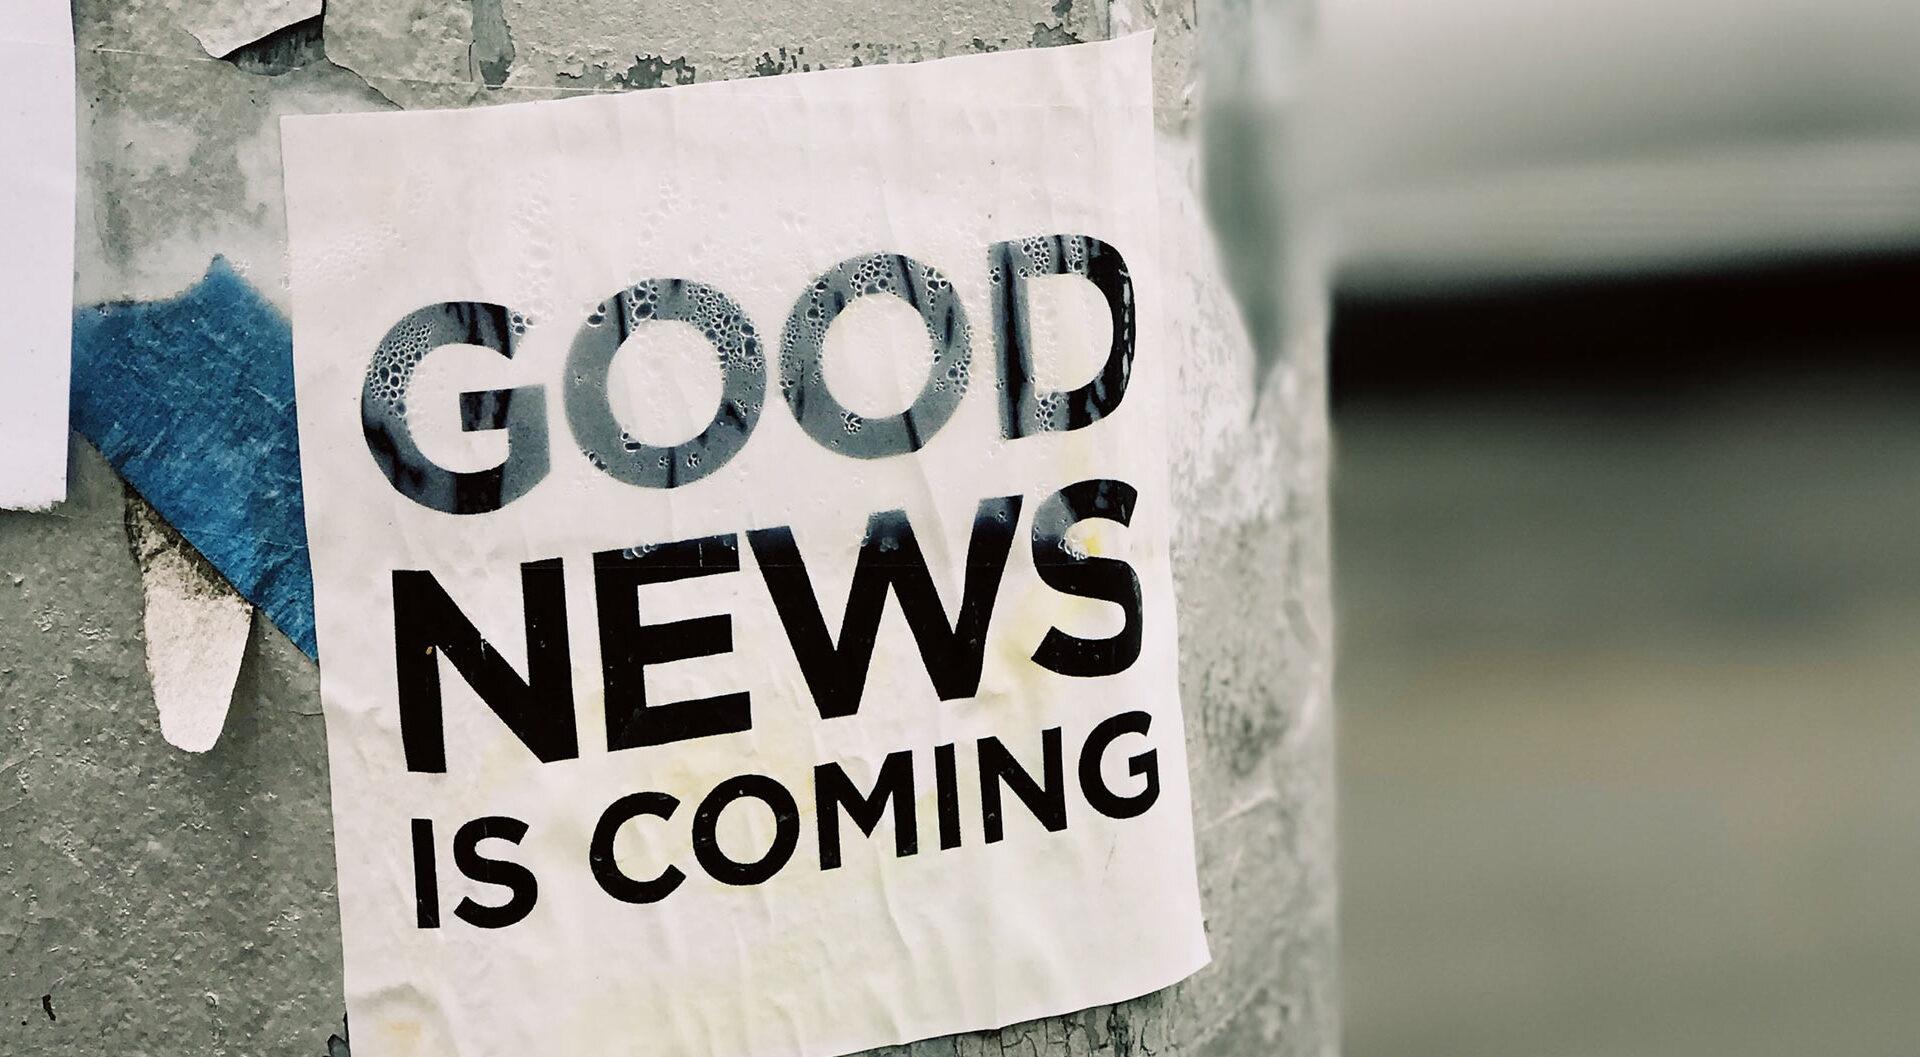 Good News is Coming by Jon Tyson on Unsplash